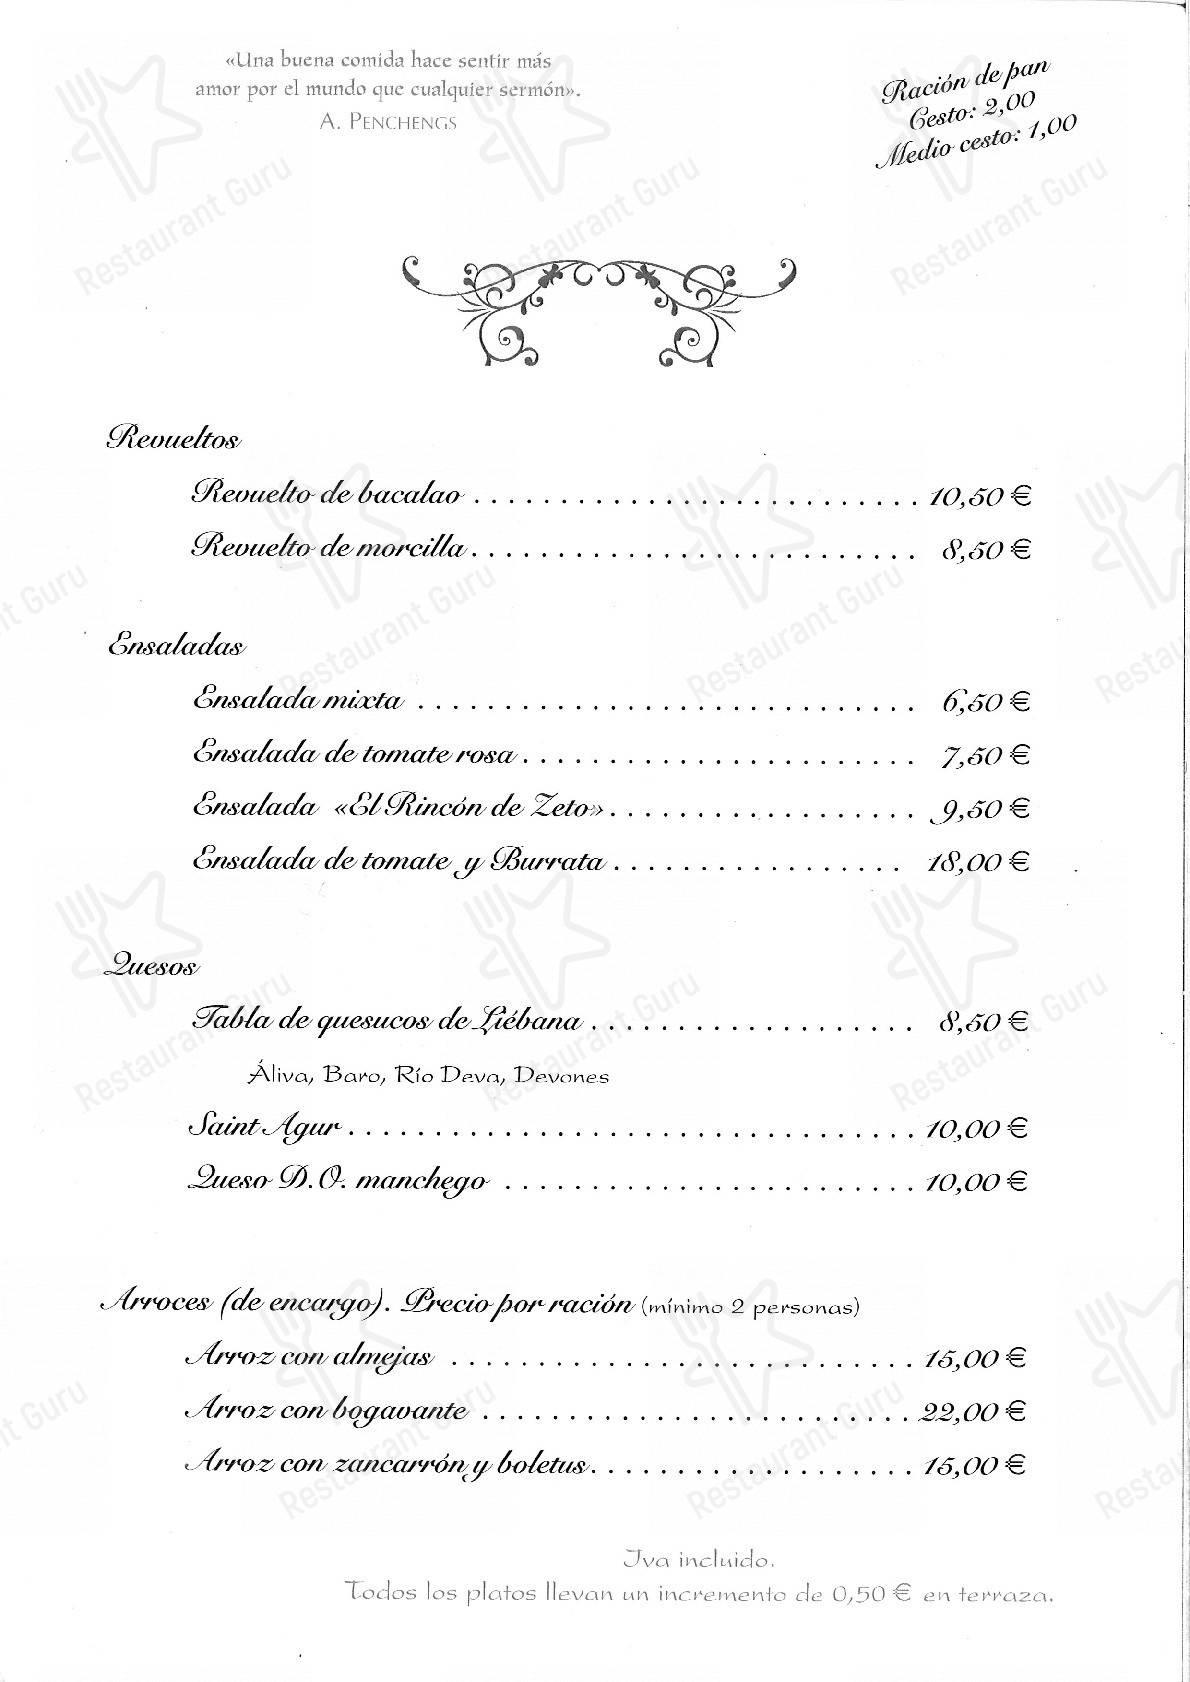 Check out the menu for El Rincon de Zeto